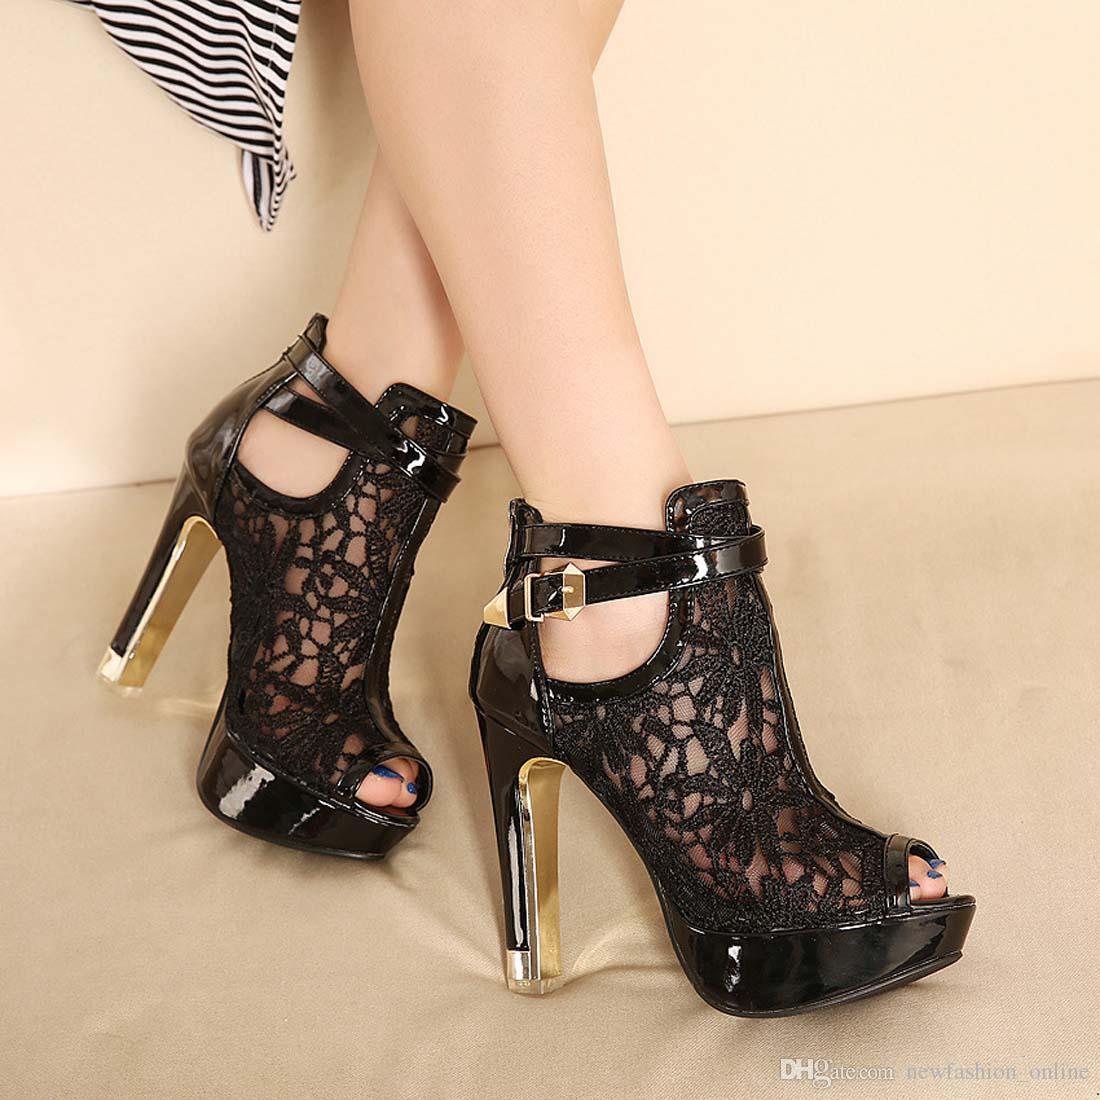 Black dress sandals for wedding - Women Sandals Lace Lady Party Girl Shoes Platform White Black Wedding Shoes Stiletto High Heels Open Toe Dress Shoes Ankle Strap